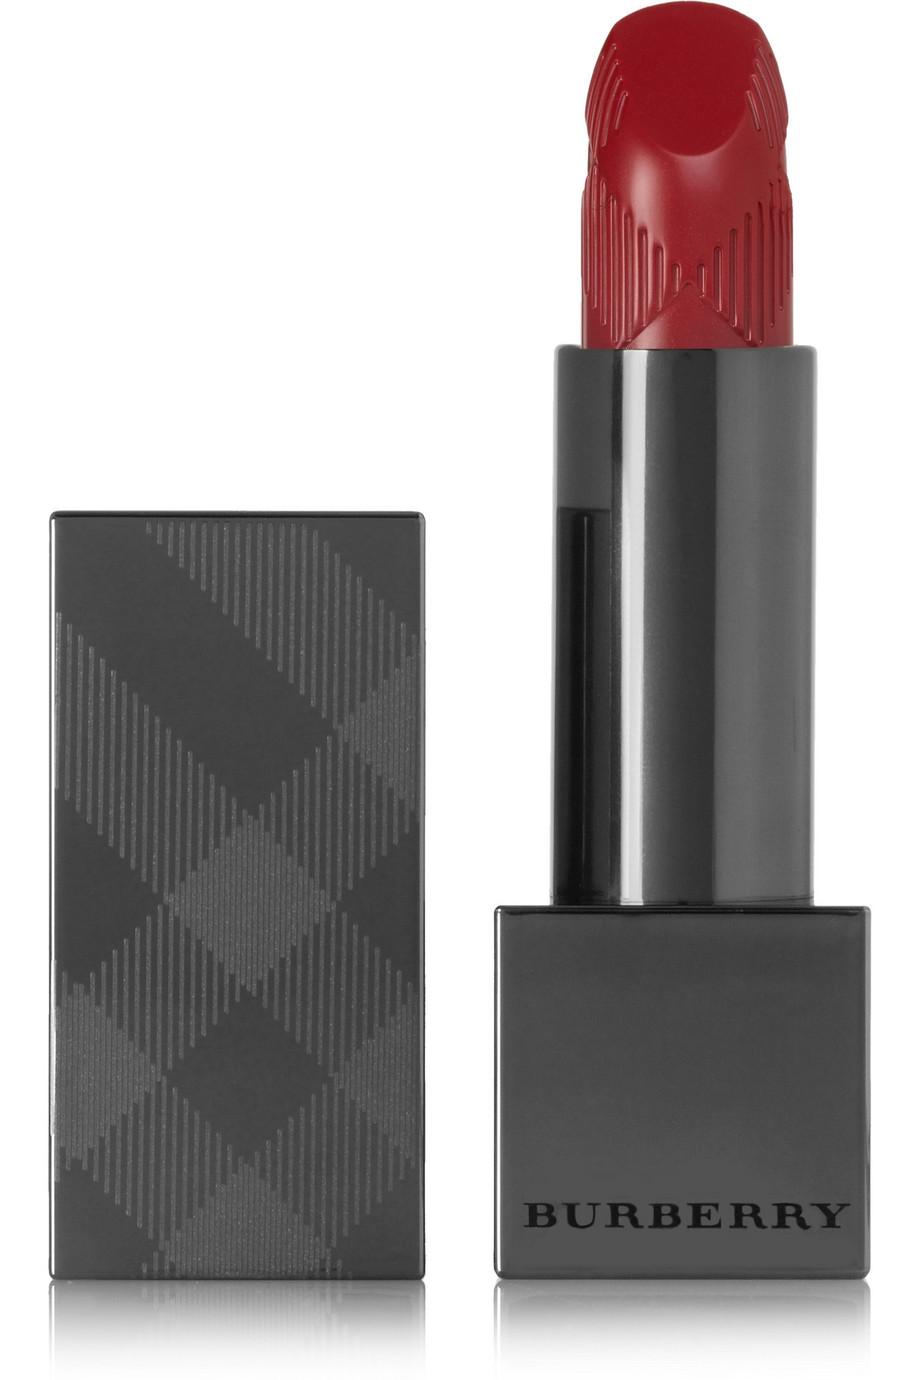 Burberry lipstick Alexa Chung